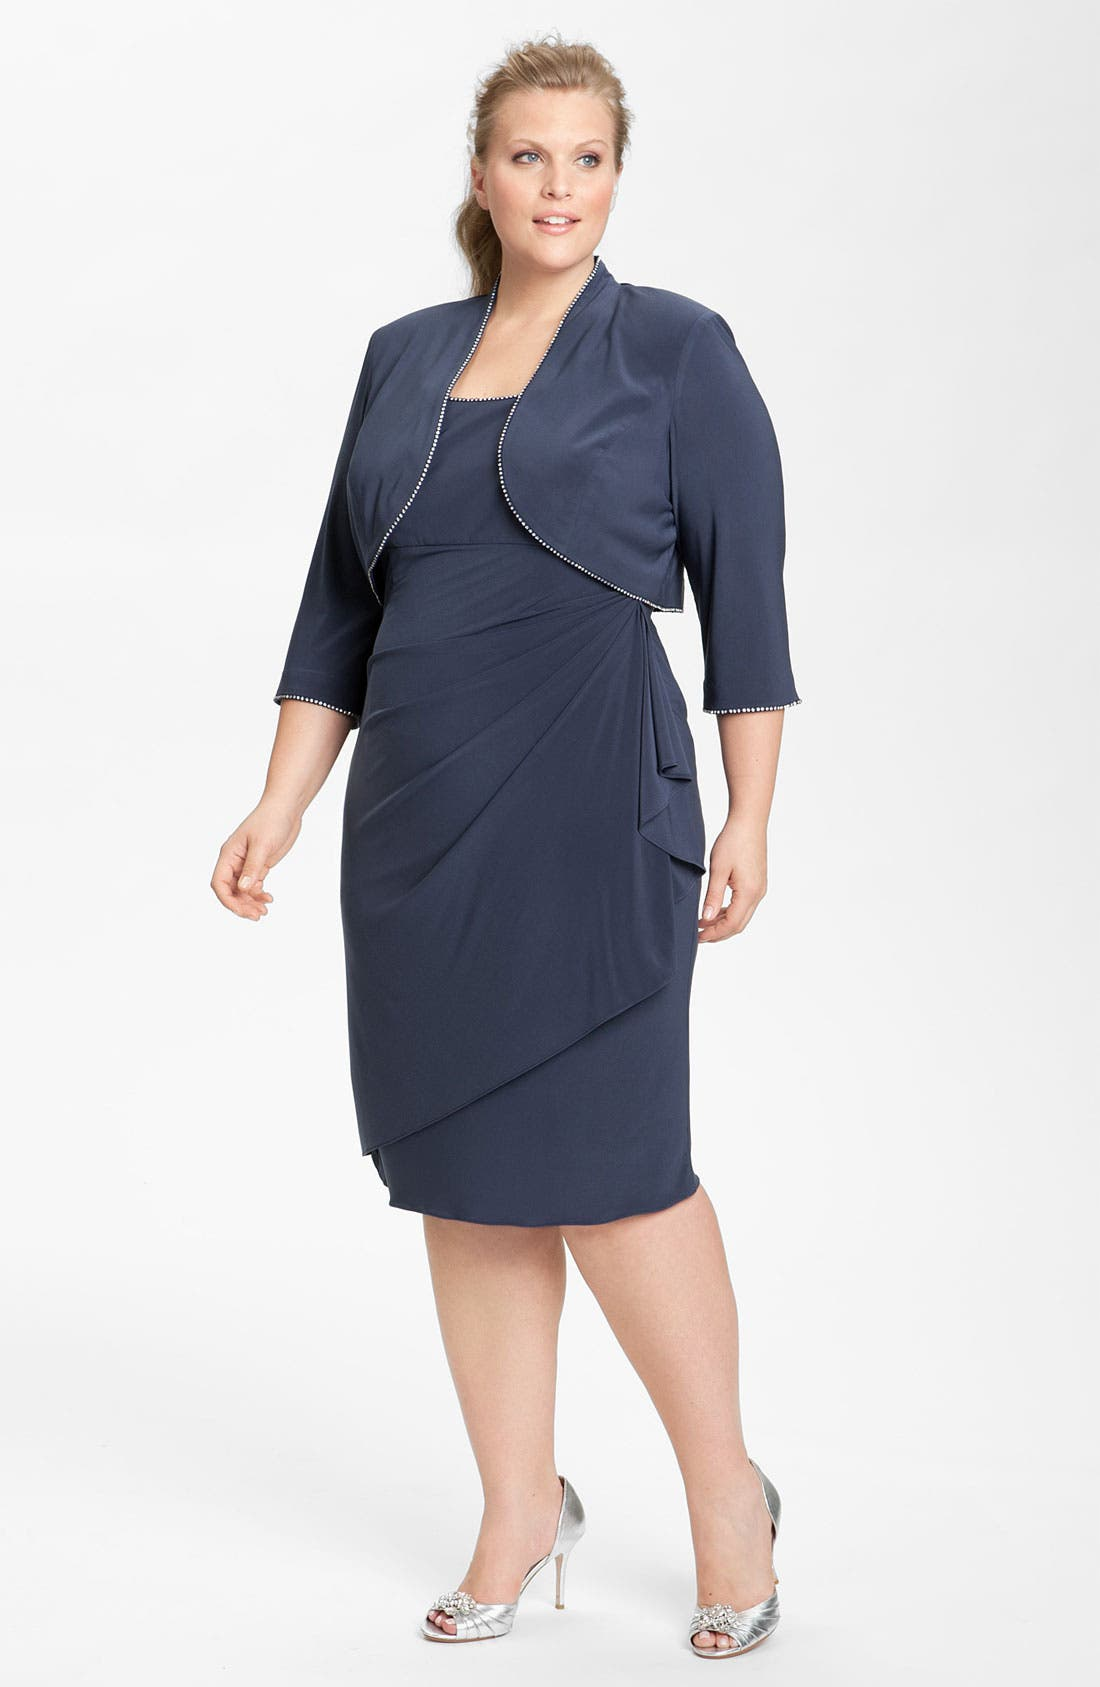 Main Image - Alex Evenings Rhinestone Trim Dress & Jacket (Plus)